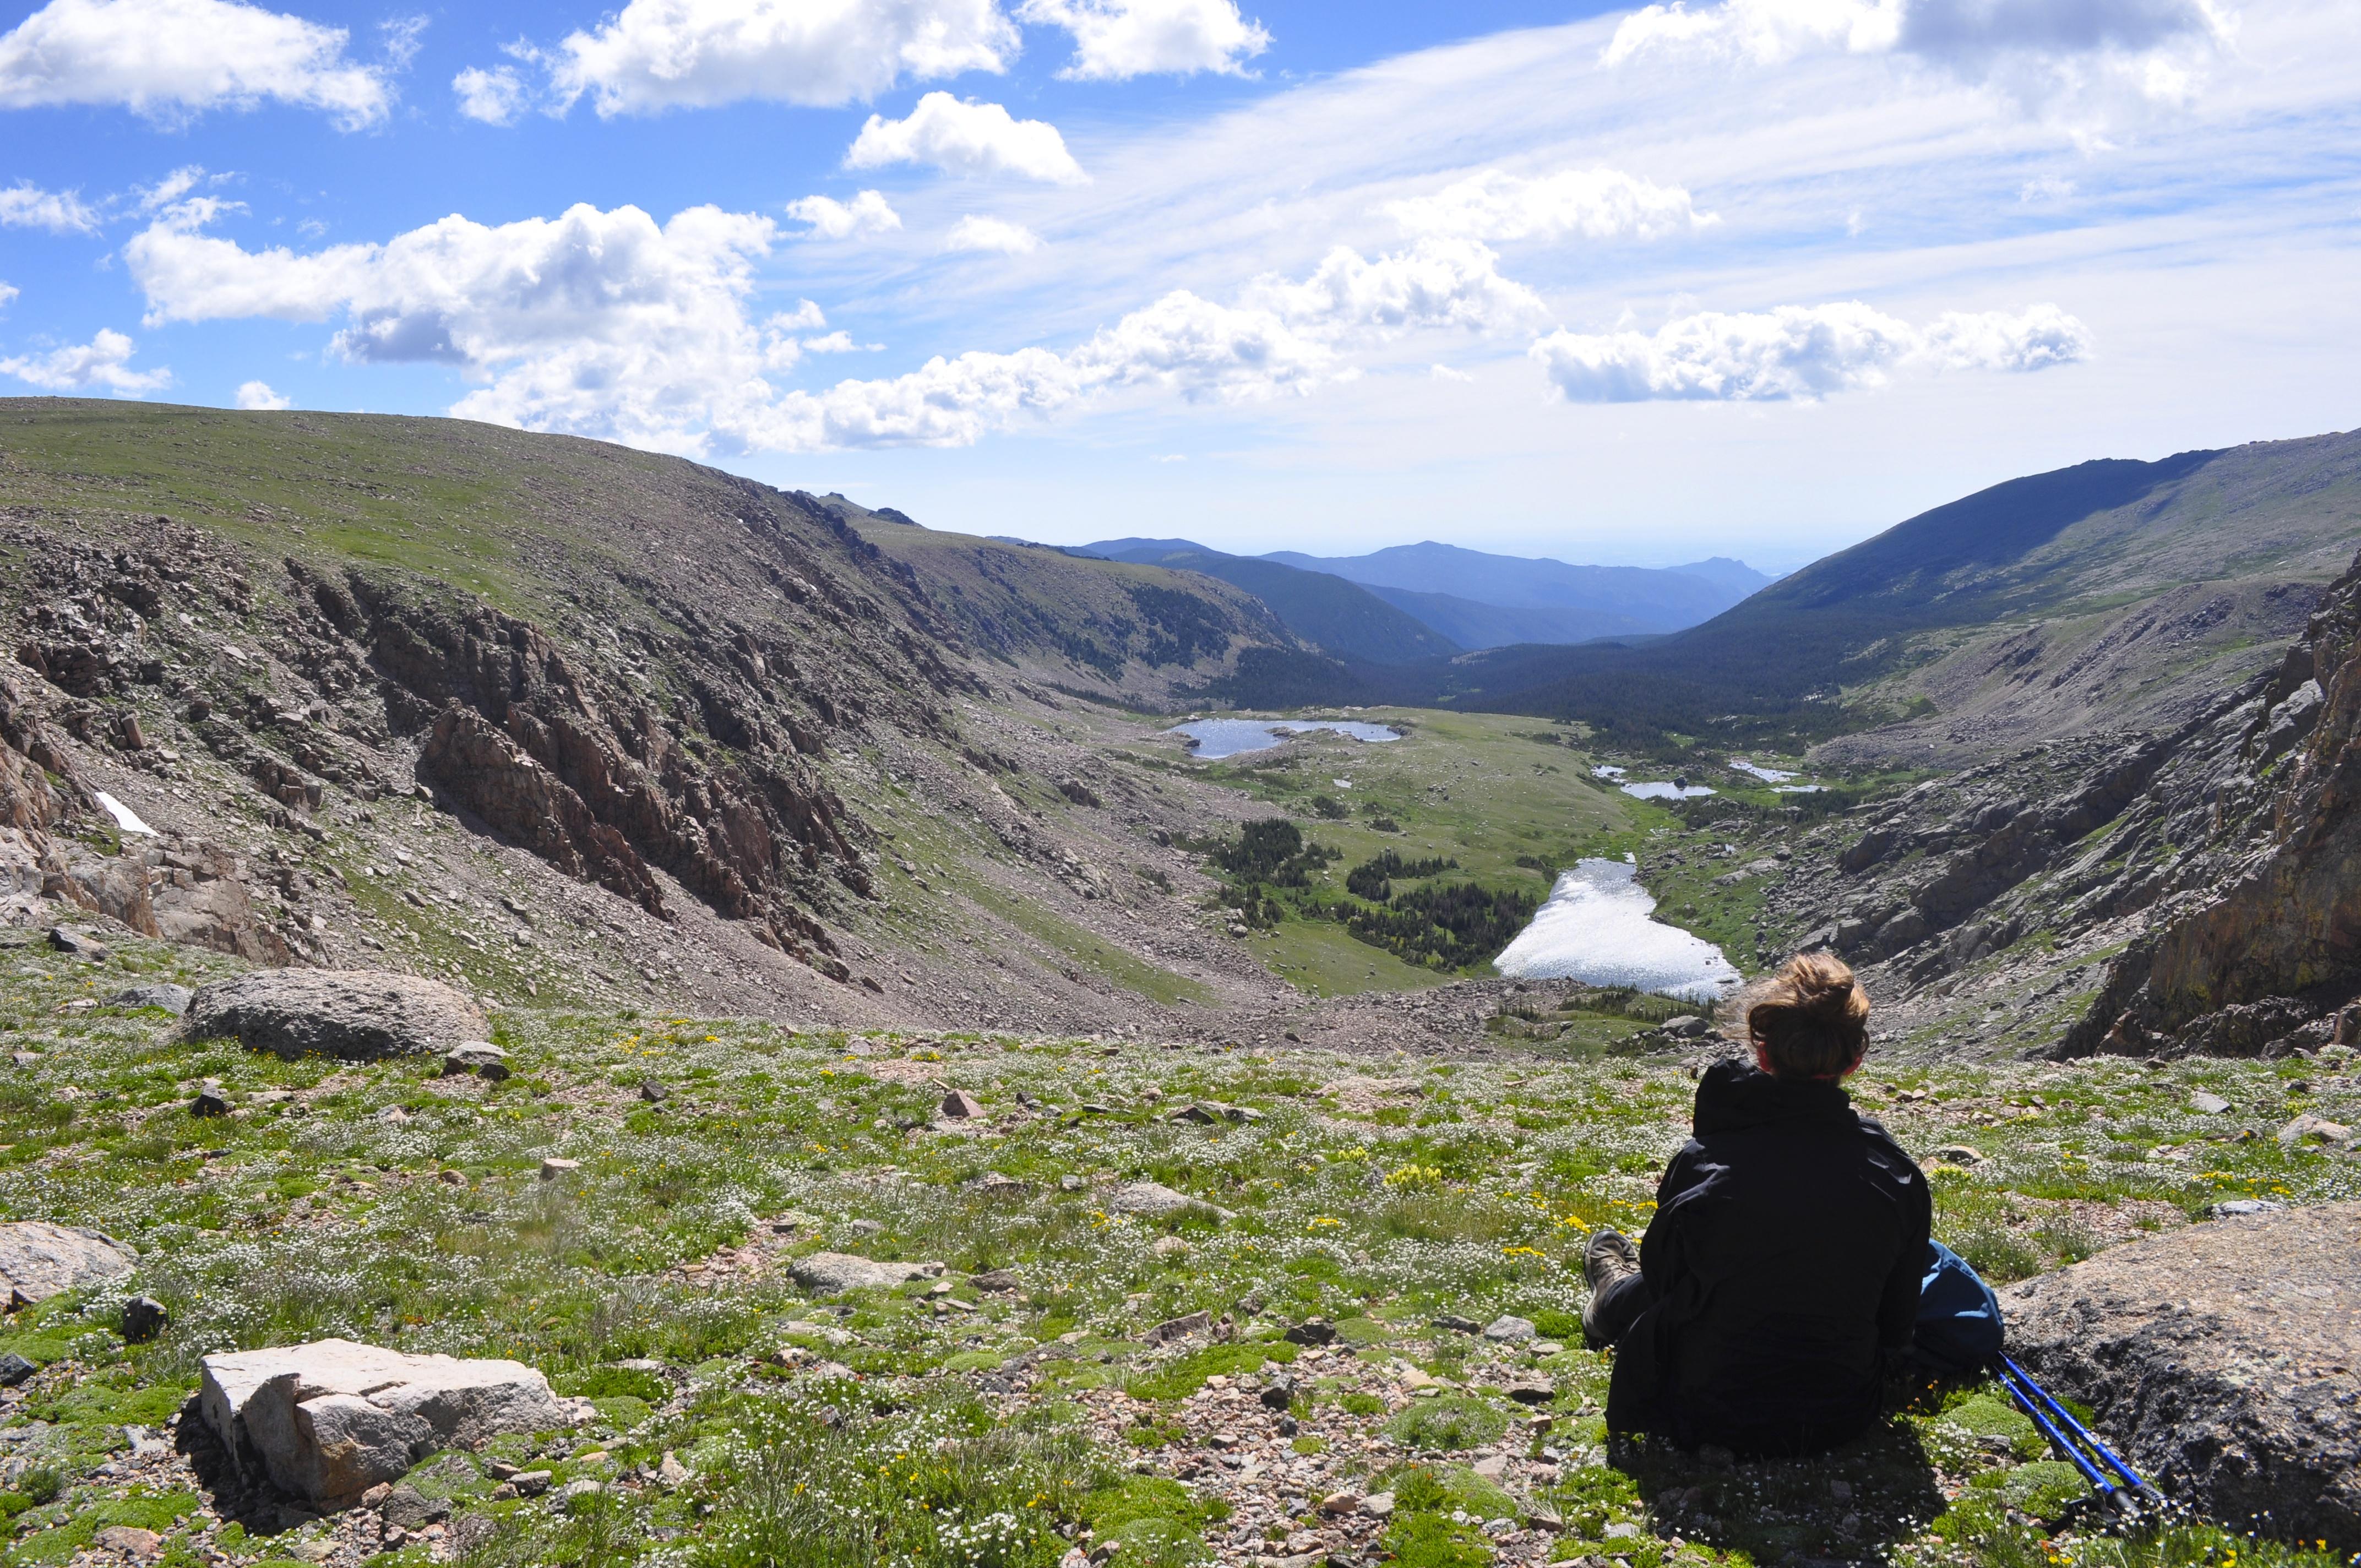 Adventure With Purpose: Meet Julia Oleksiak